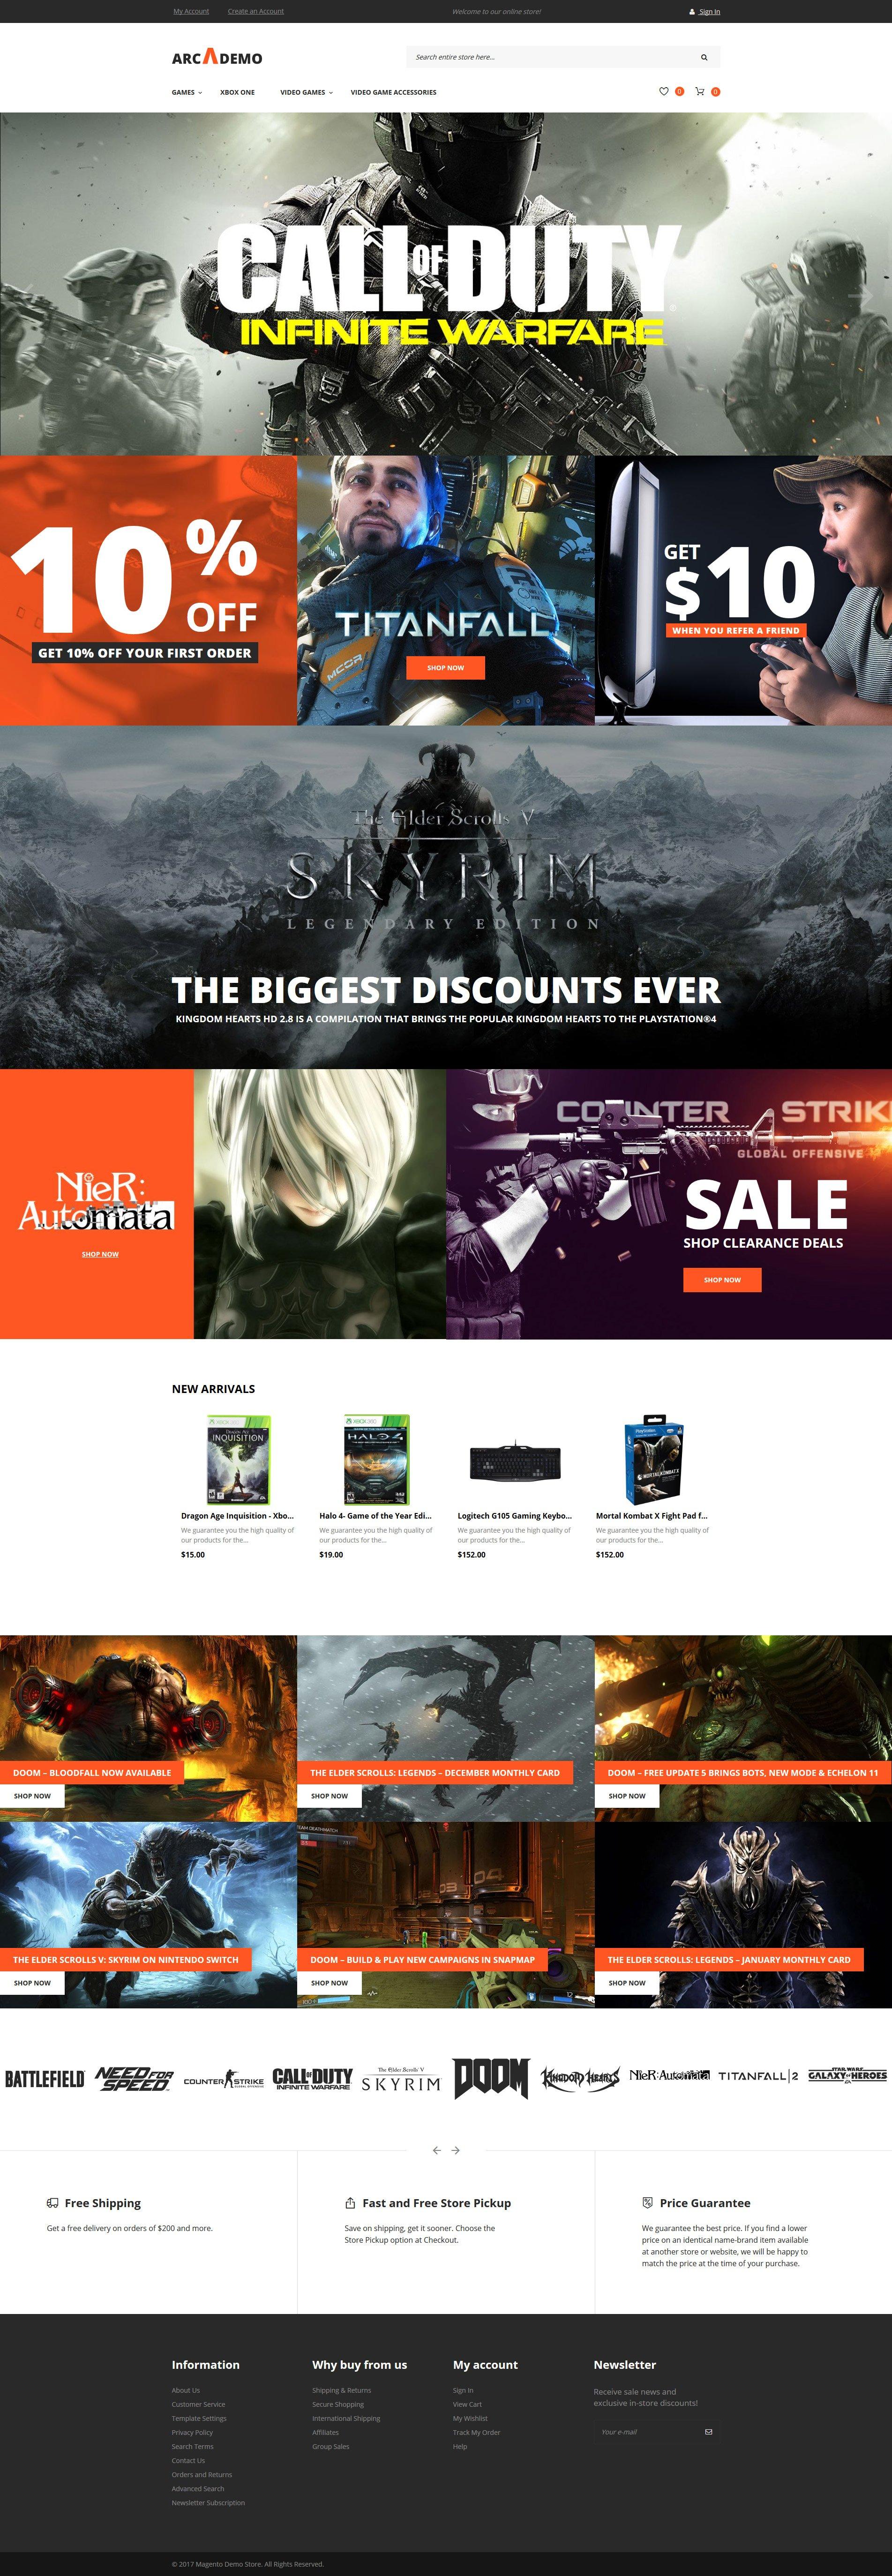 Responsywny szablon Magento Arcademo - Video Games Shop Responsive #62335